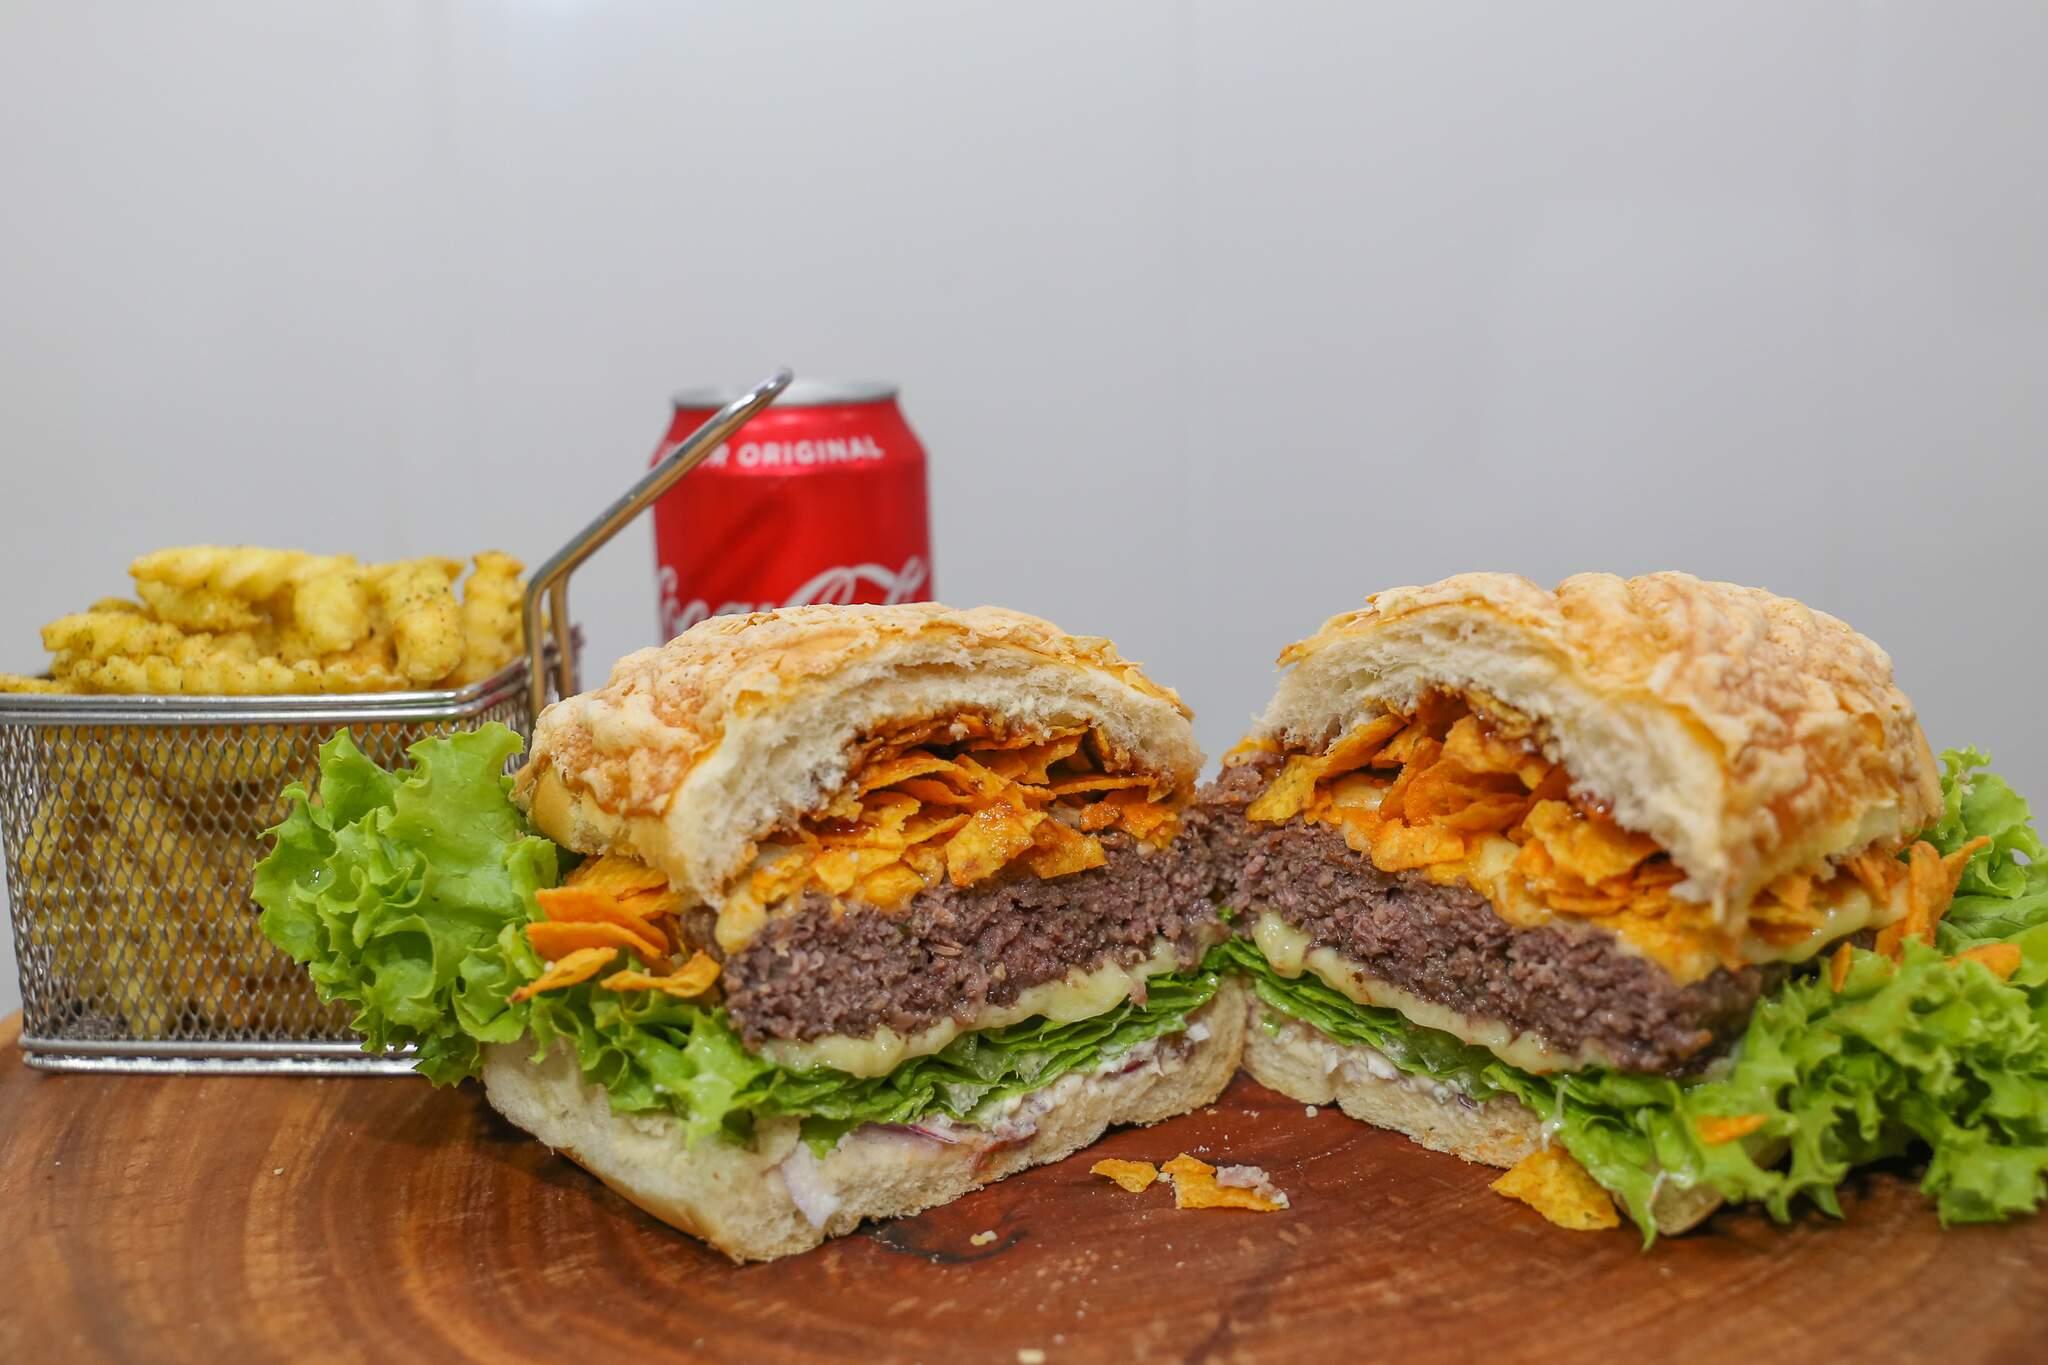 700g de hambúrguer de verdade é só na JG Burger. (Foto: Paulo Francis)